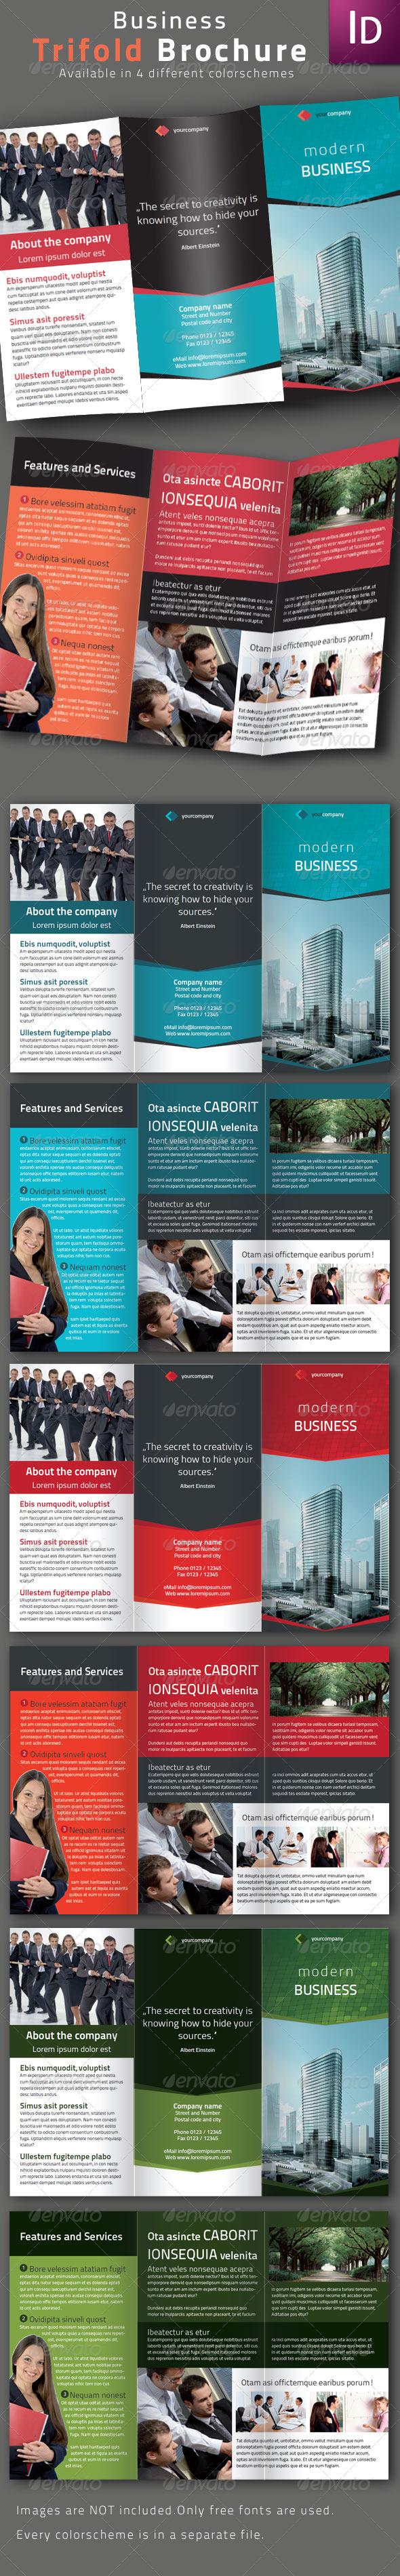 Business Trifold Brochure II - Corporate Brochures